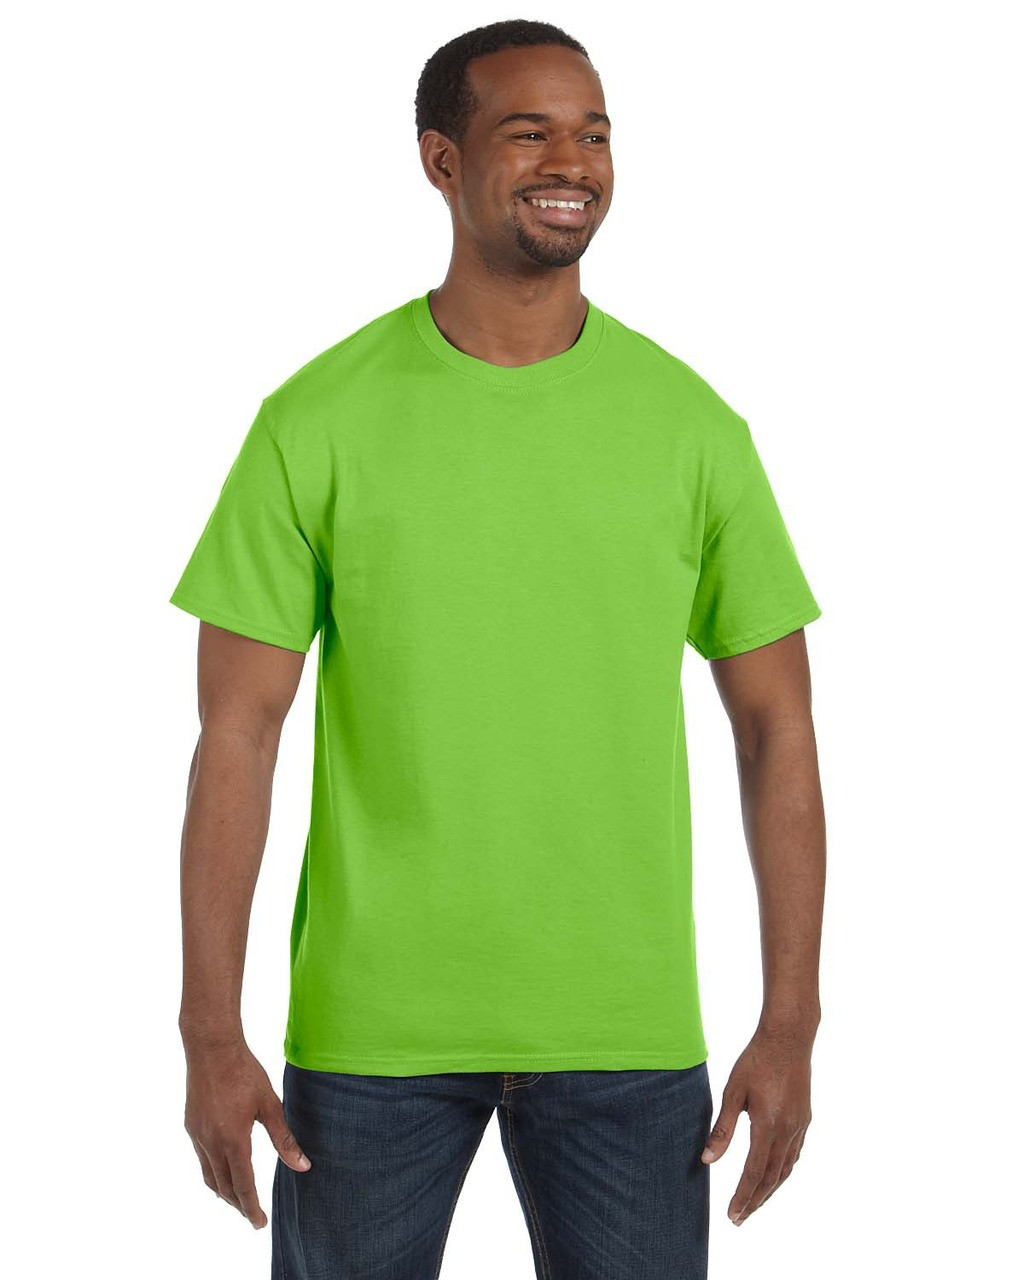 Gildan Mens Seamless Double Needle T-Shirt Maroon 4XL Pack of 5